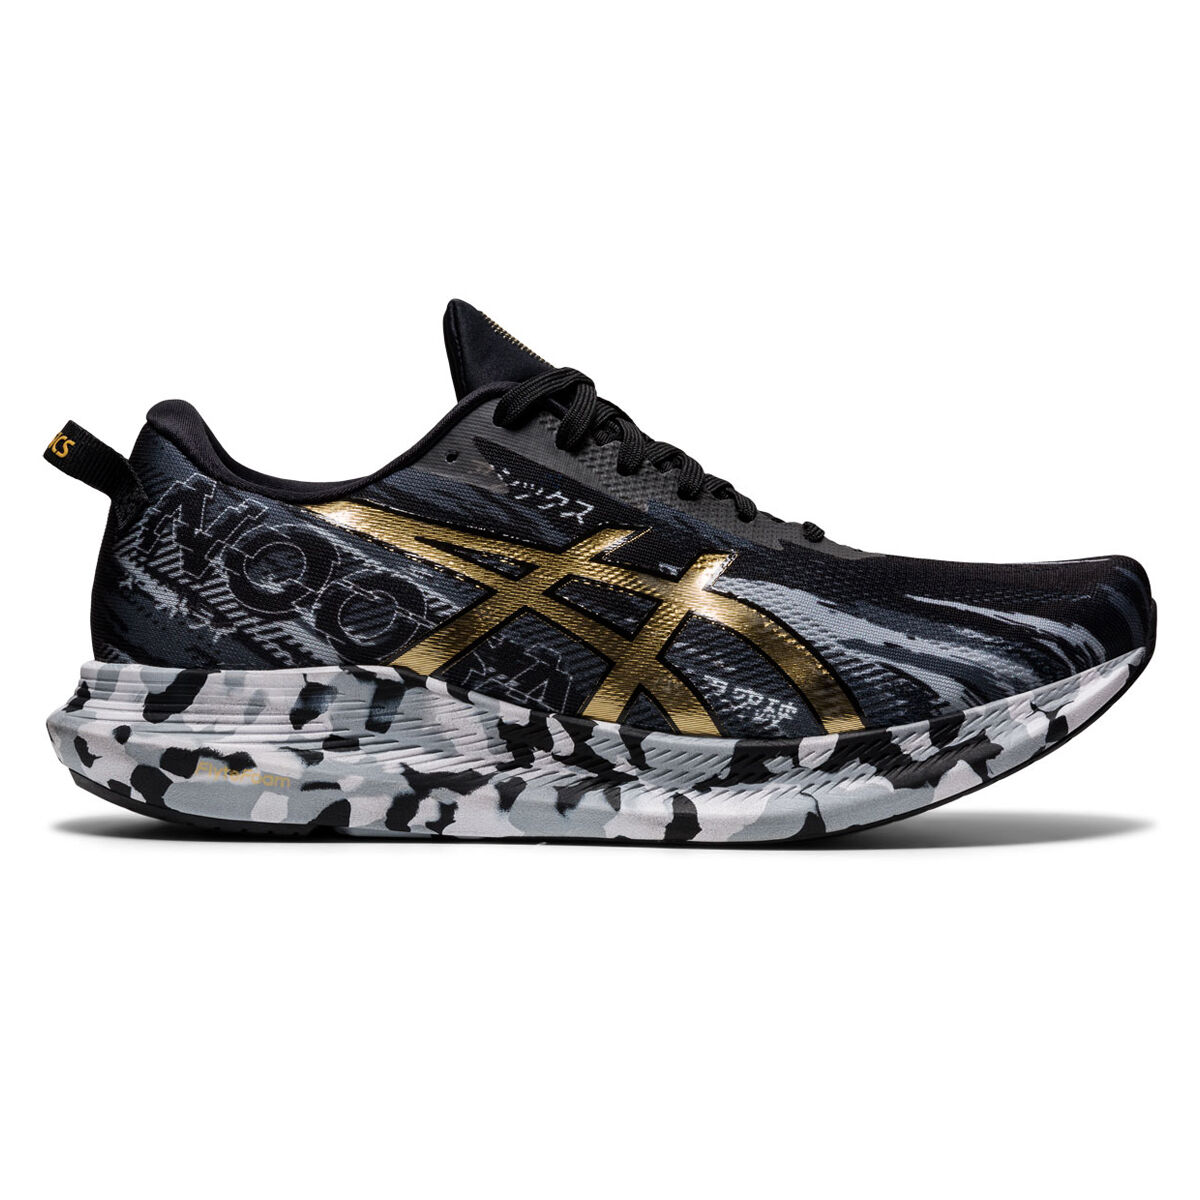 Asics GEL Noosa Tri 13 Mens Running Shoes